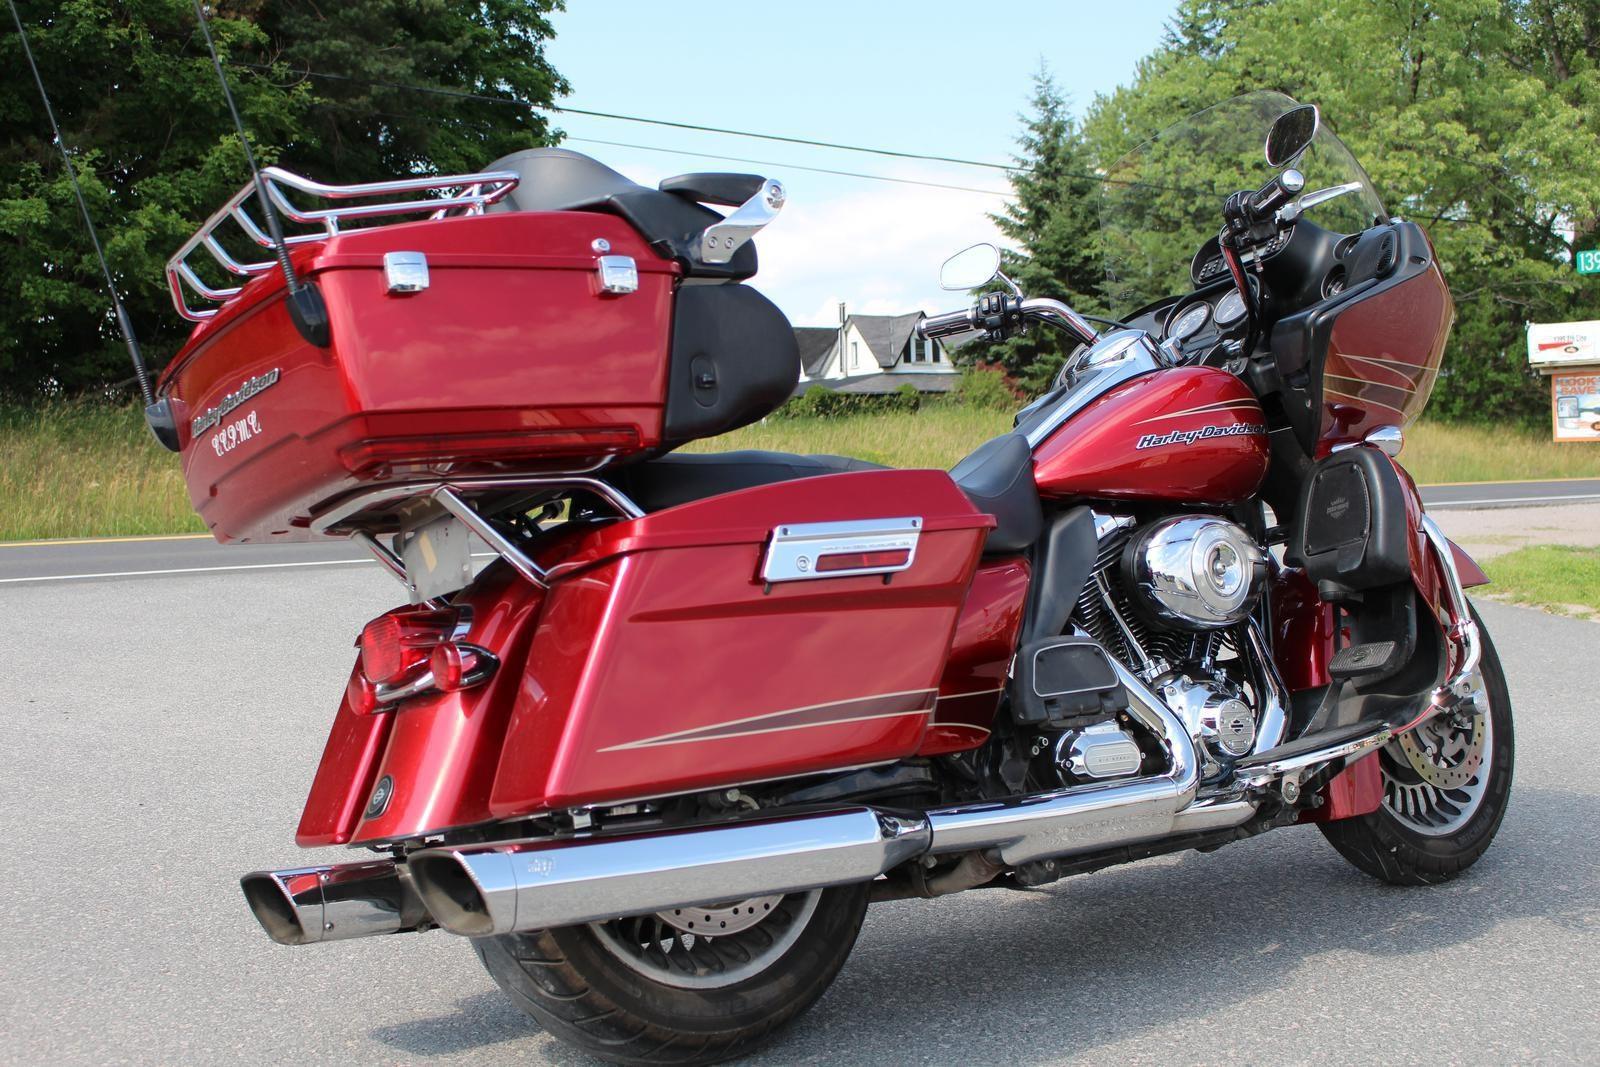 harley davidson fltru road glide ultra 2012 used motorcycle for sale in lakefield ontario. Black Bedroom Furniture Sets. Home Design Ideas